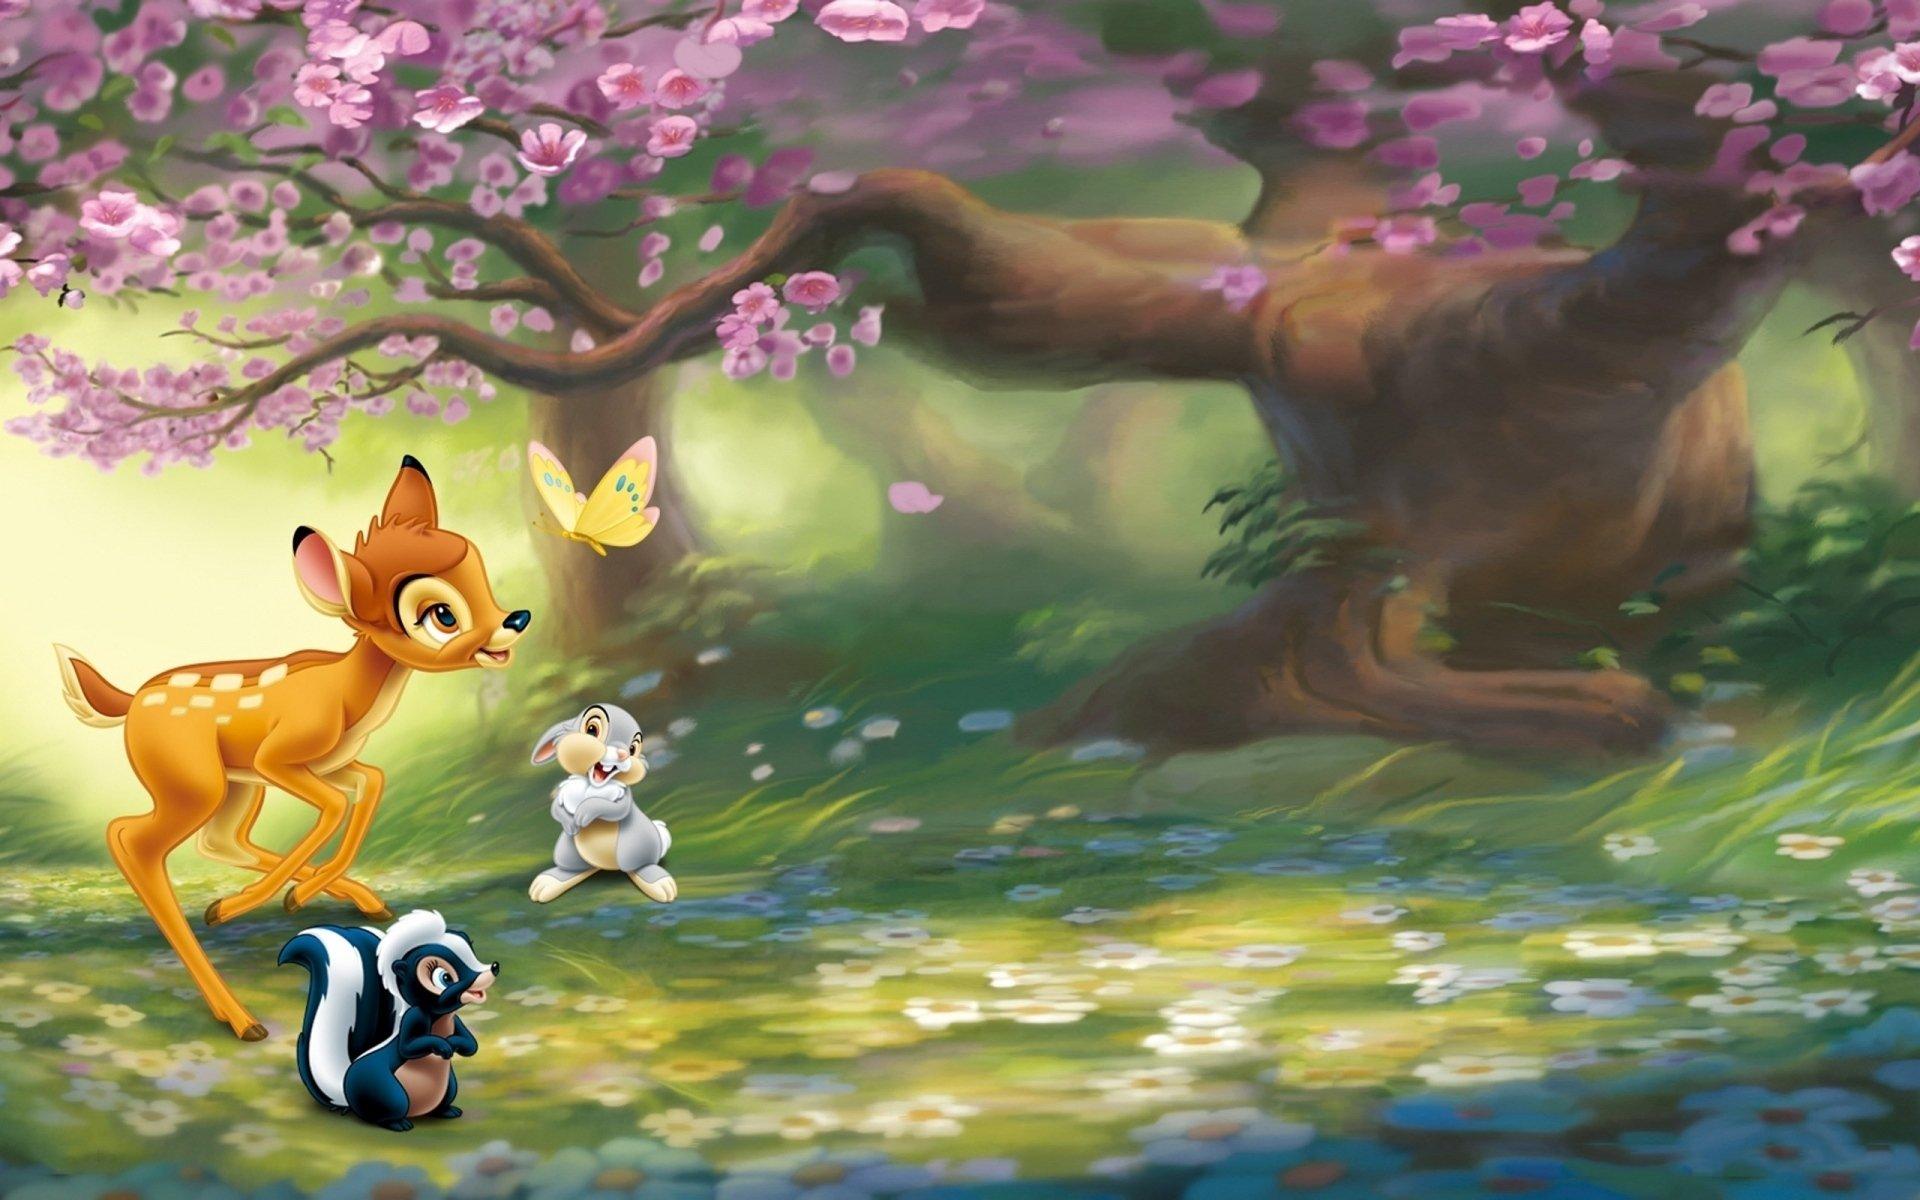 Movie - Bambi  Fawn Animal Butterfly Rabbit Tree Cherry Tree Flower Skunk Disney Wallpaper